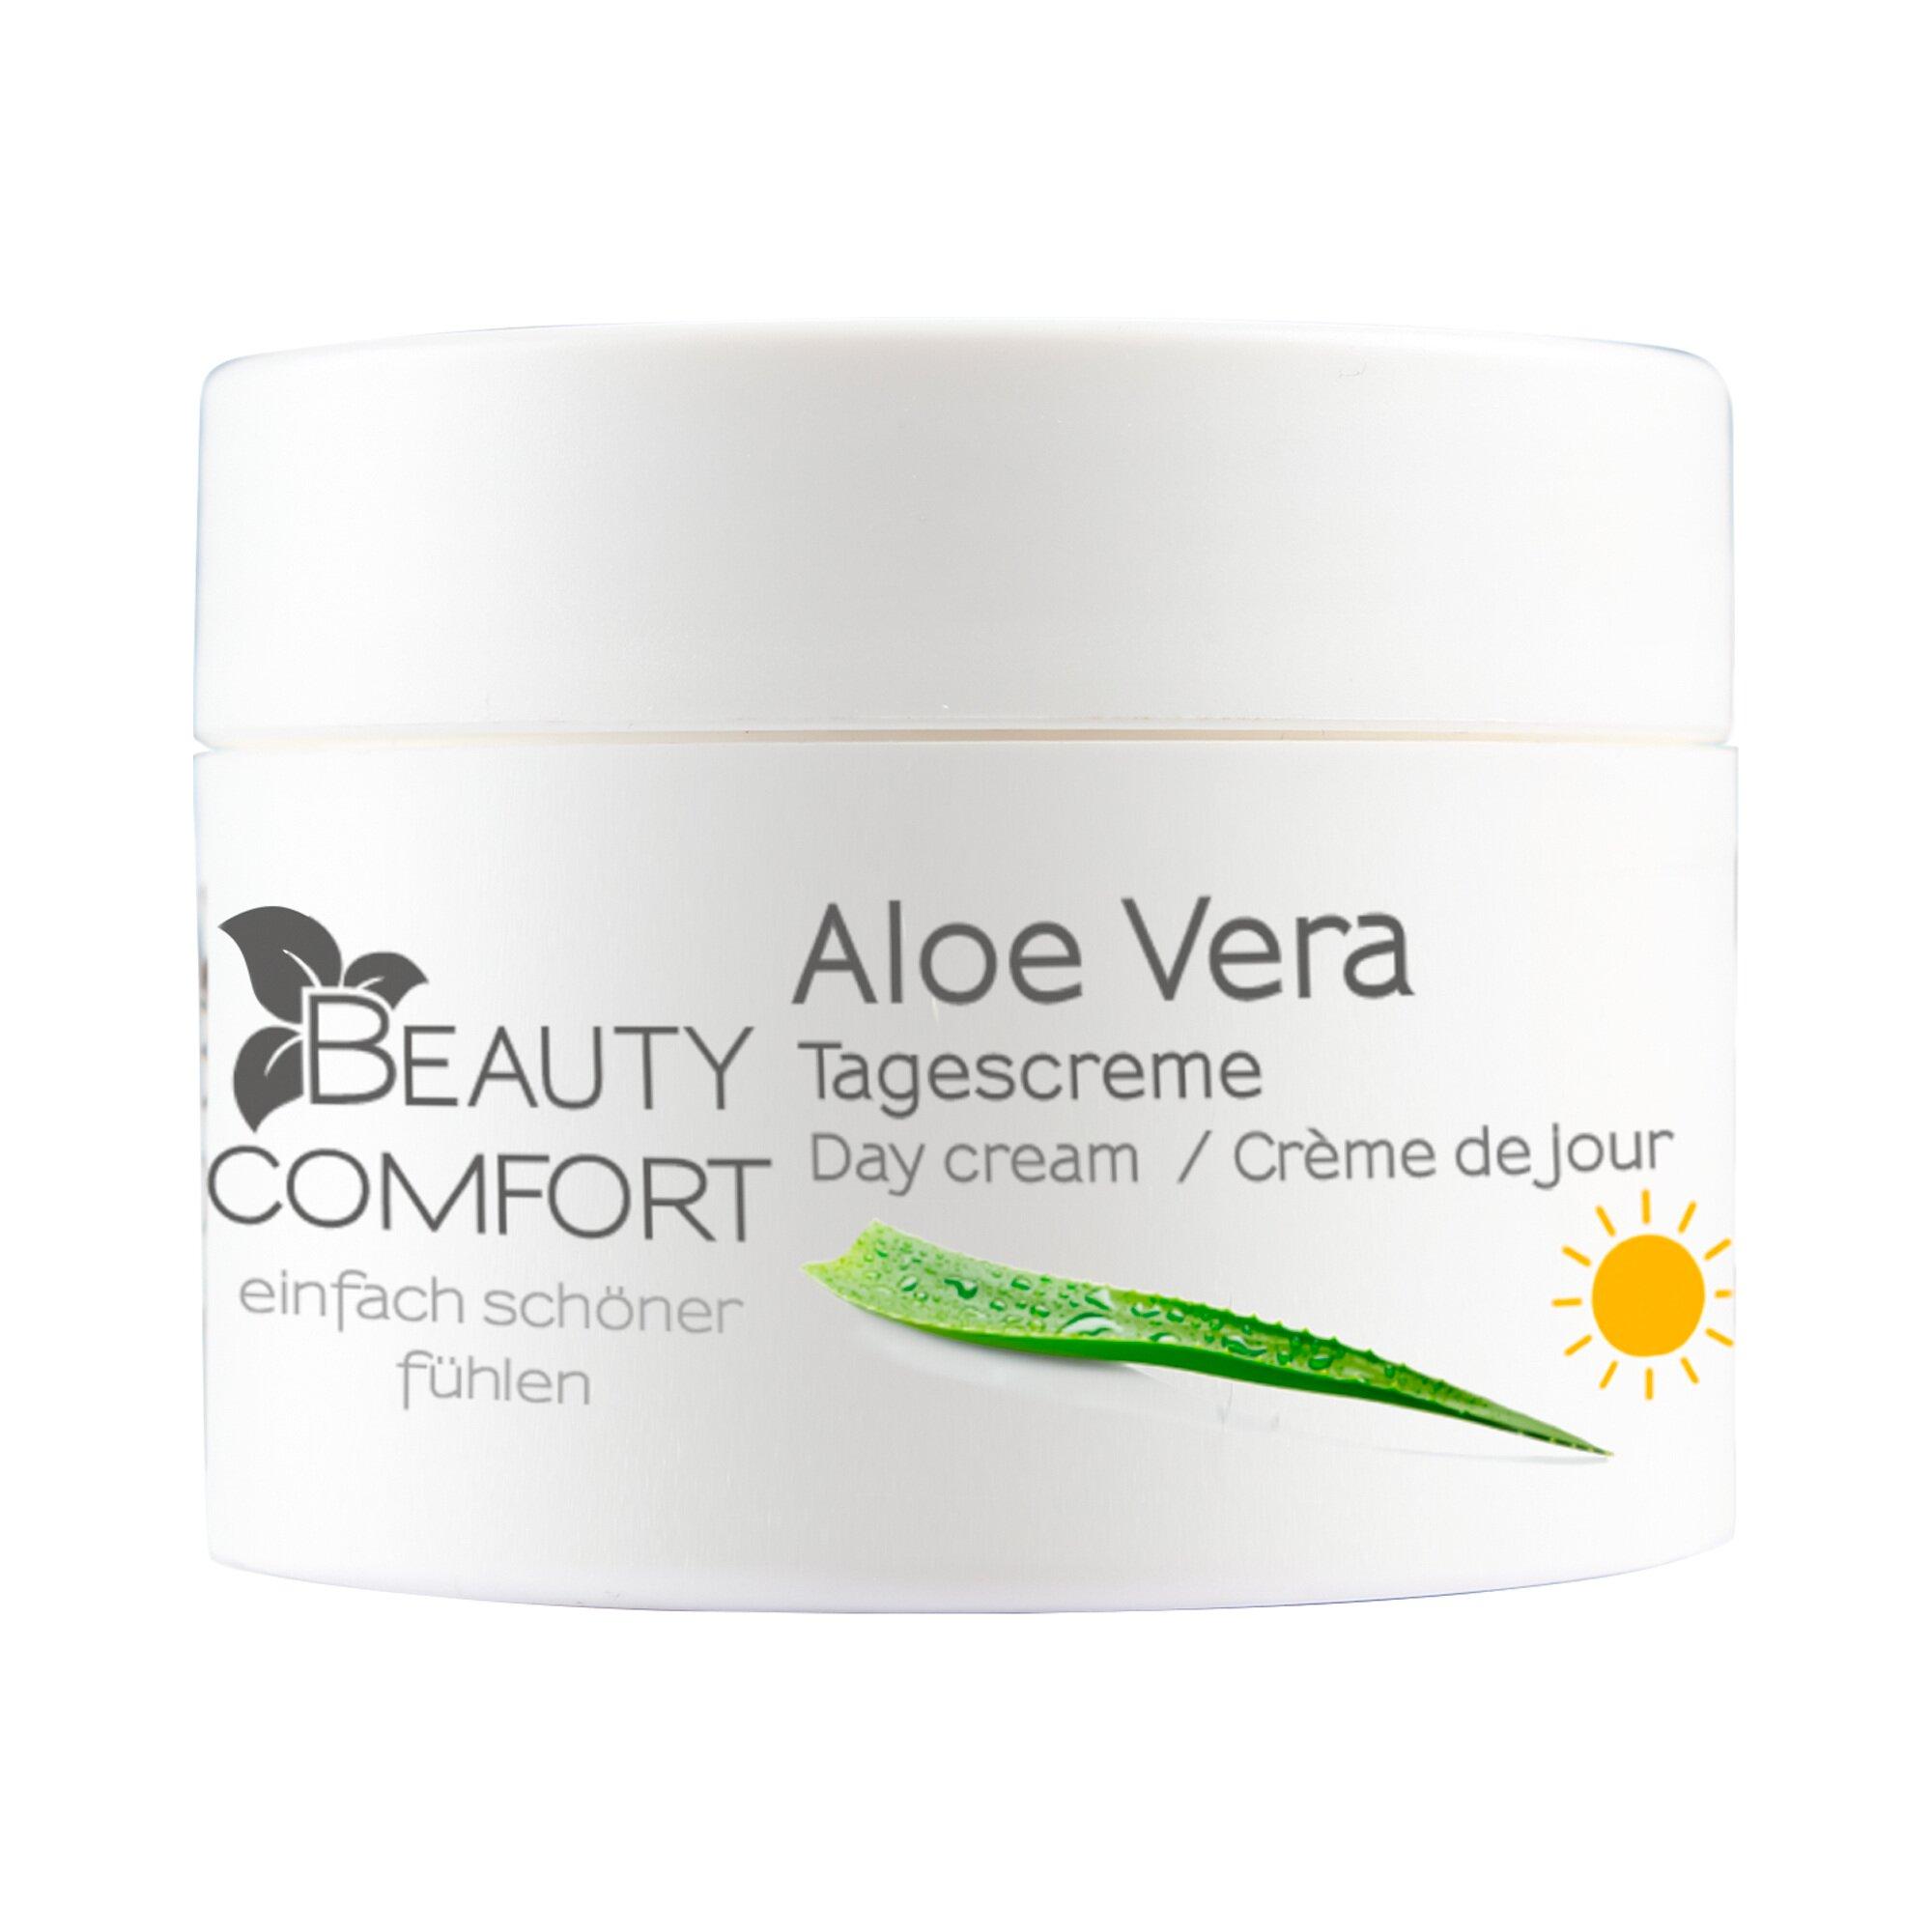 Image of Aloe-Vera